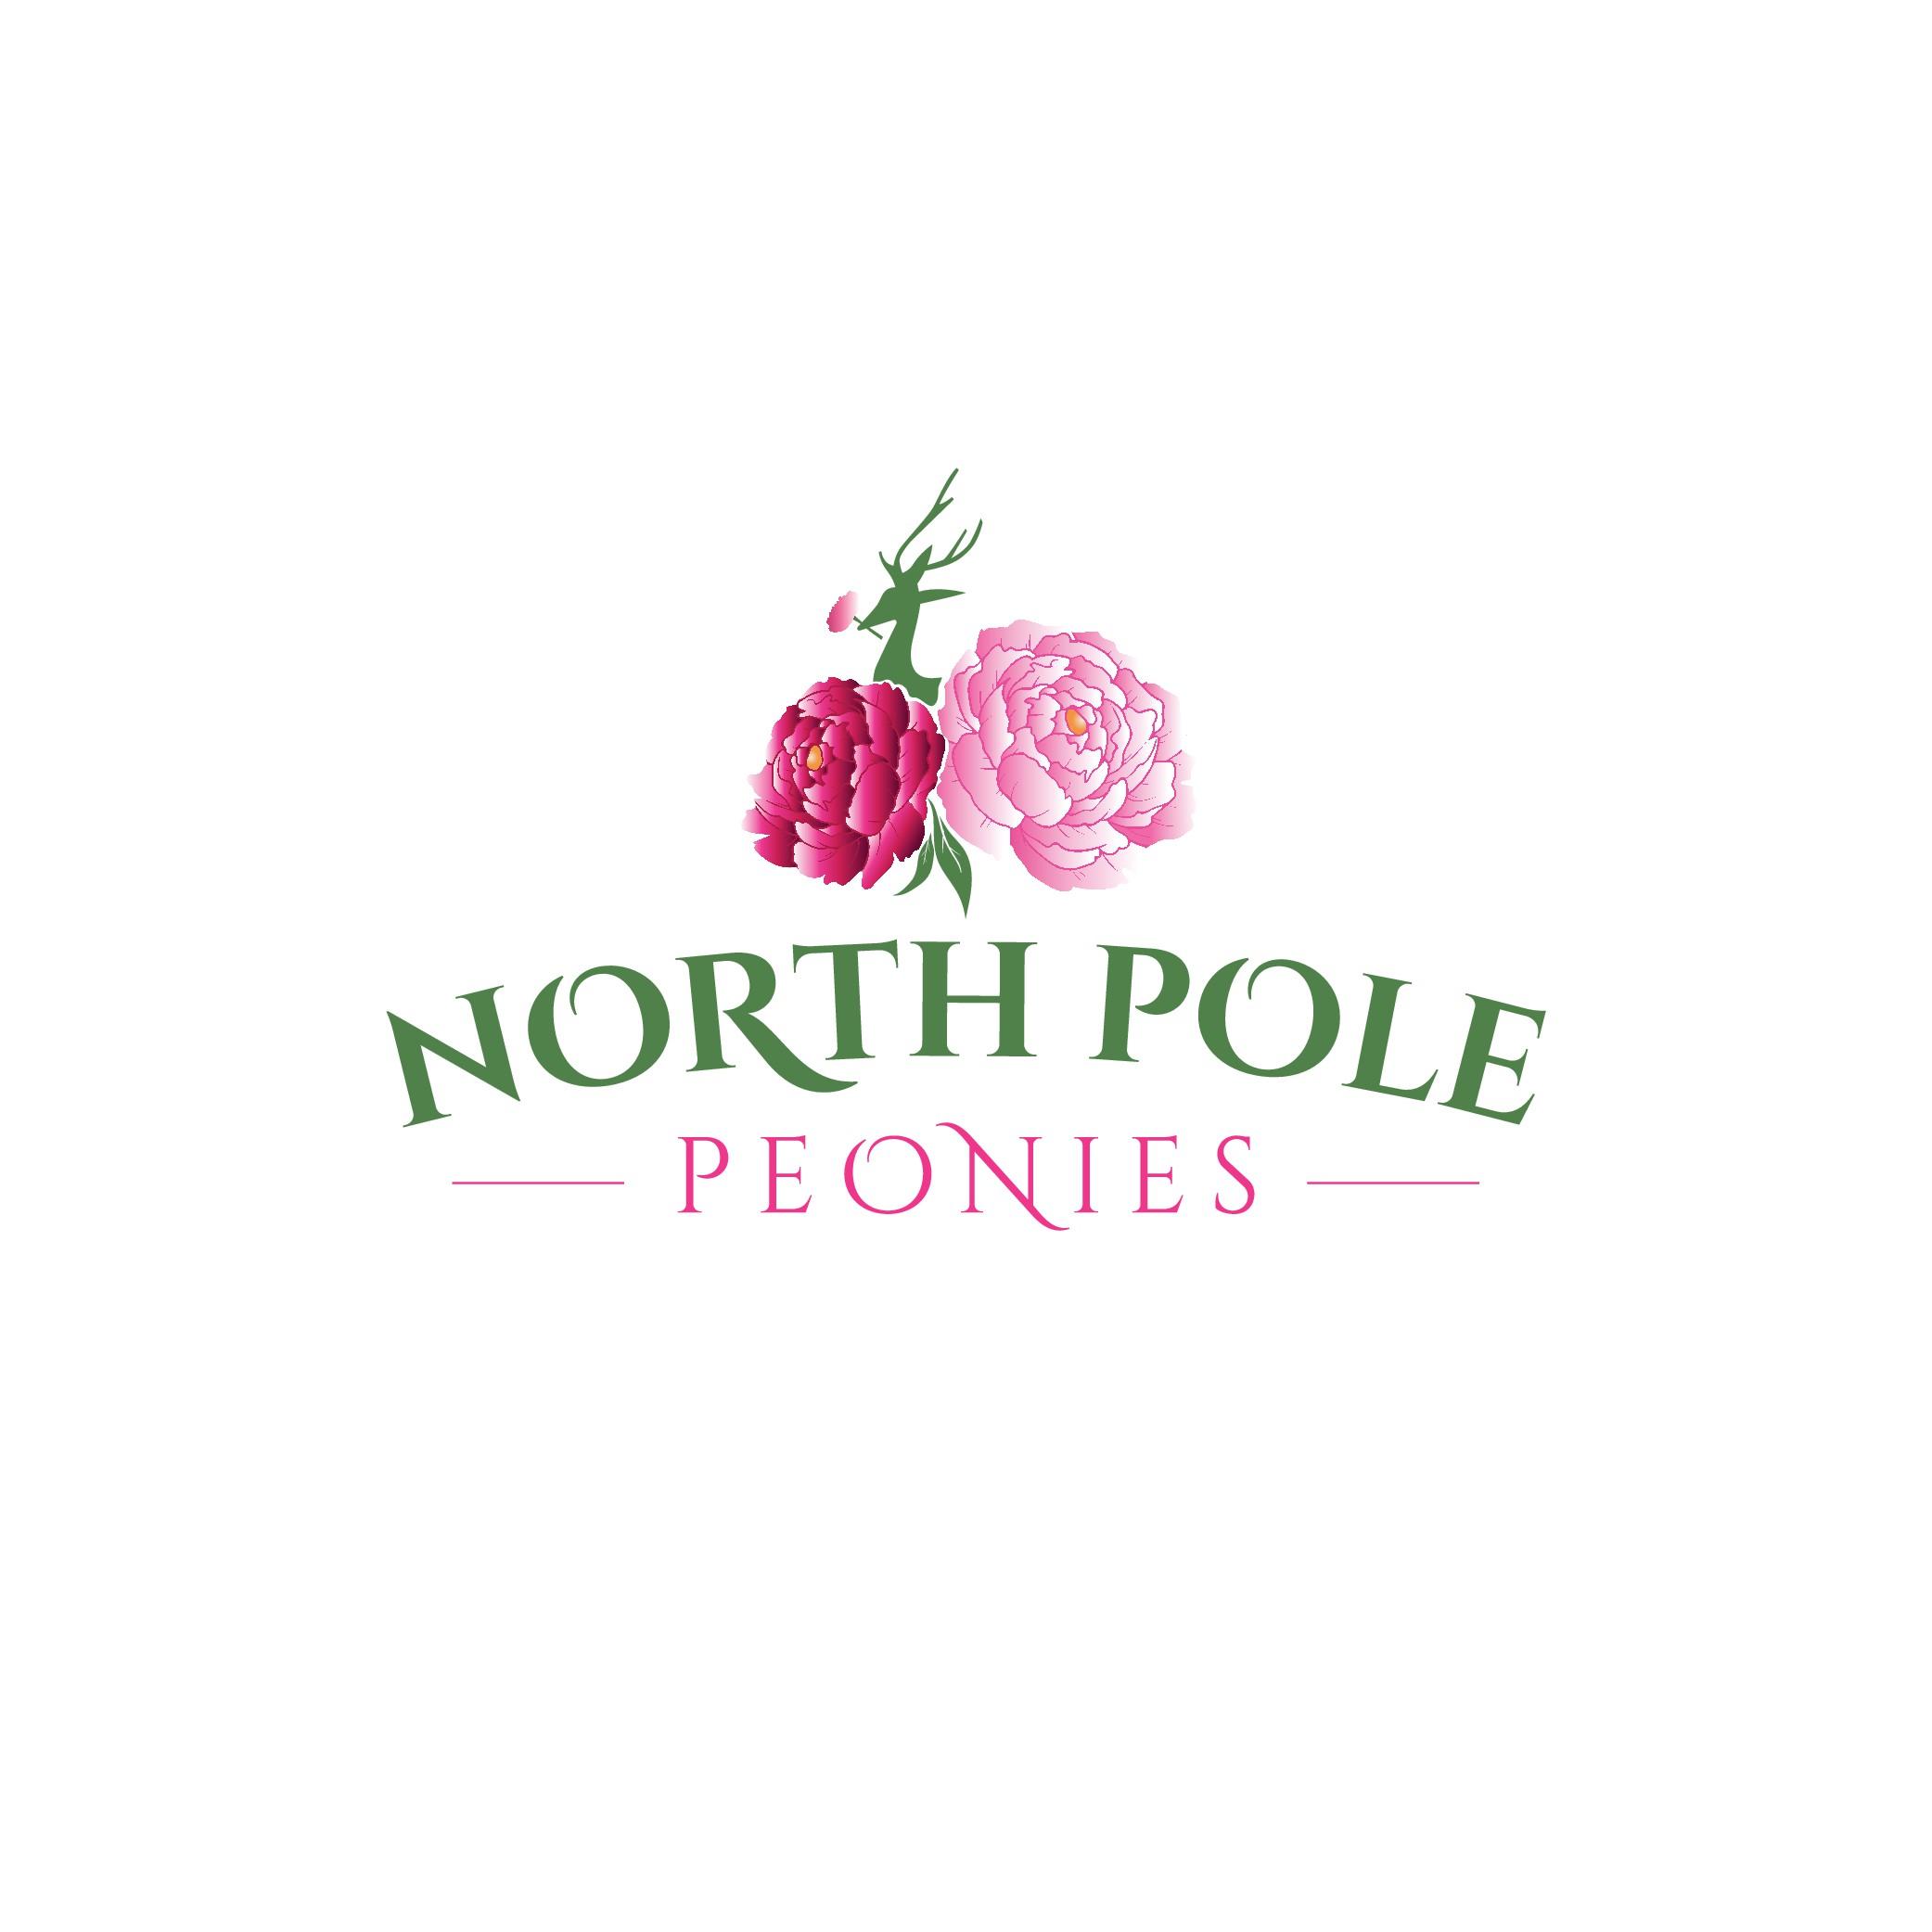 Family peony flower farm wants a stunning, Alaskan logo